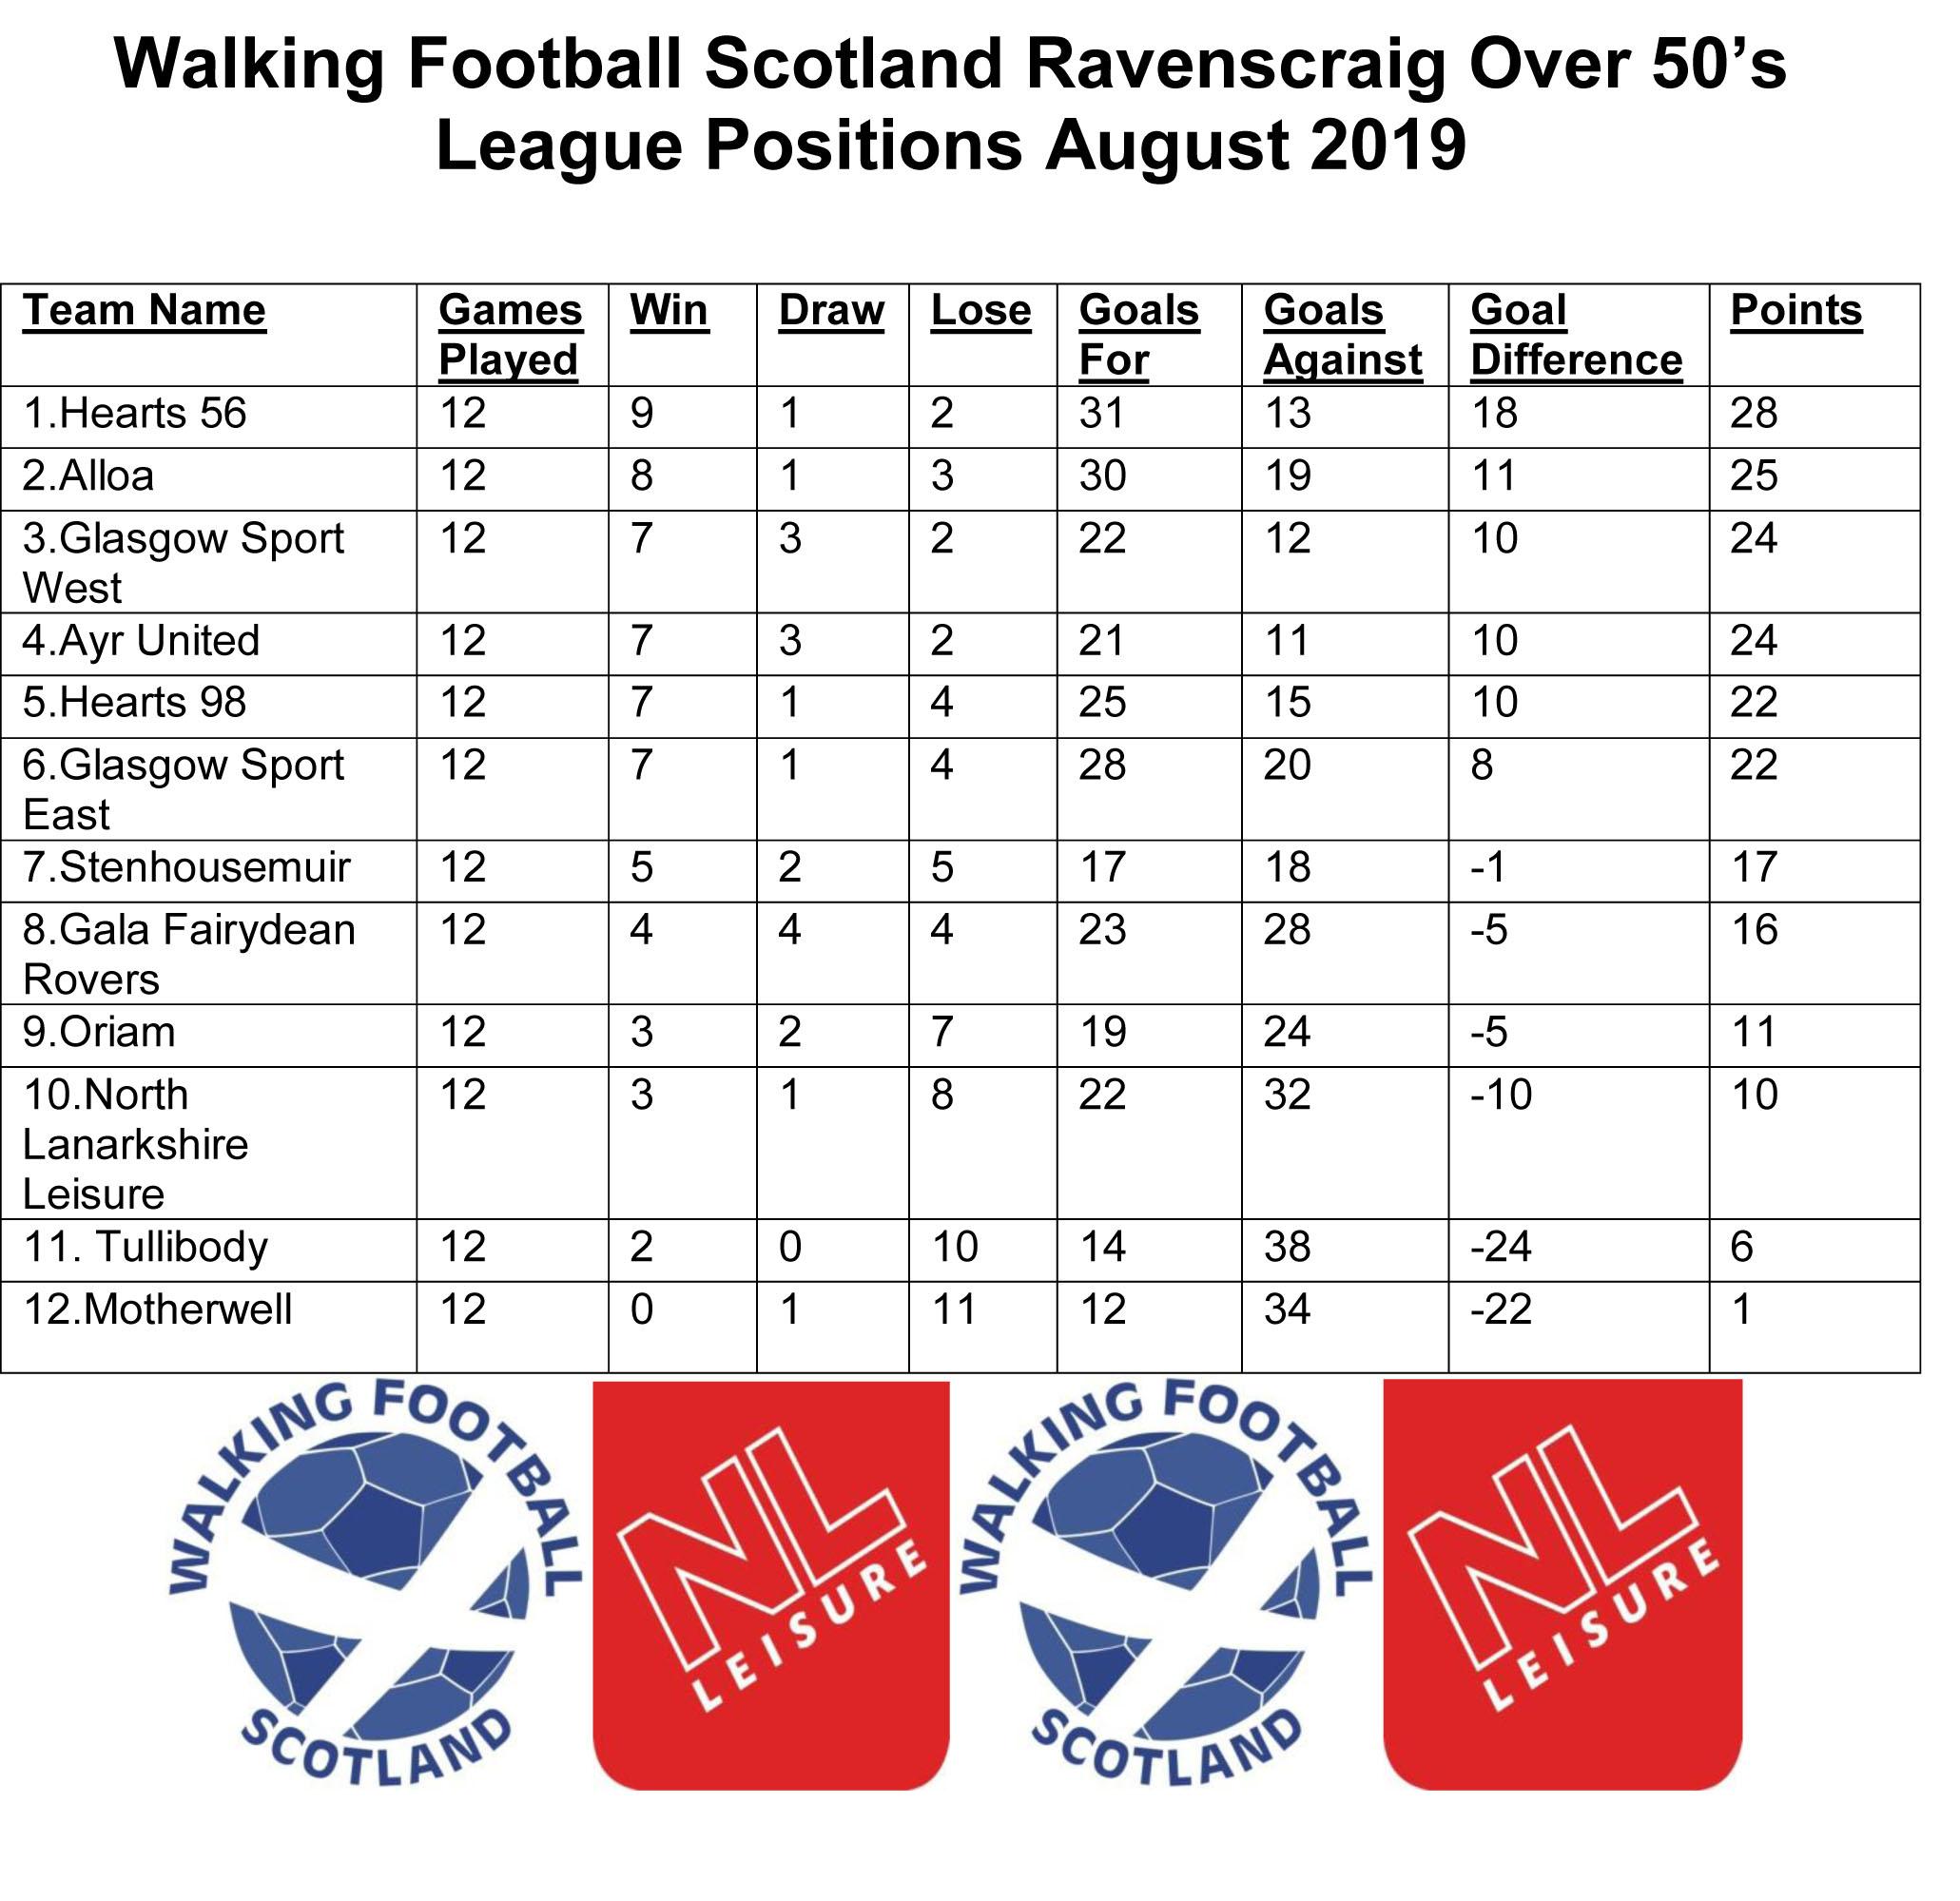 Walking Football Scotland Ravenscraig Over 50 League Positions August.jpg